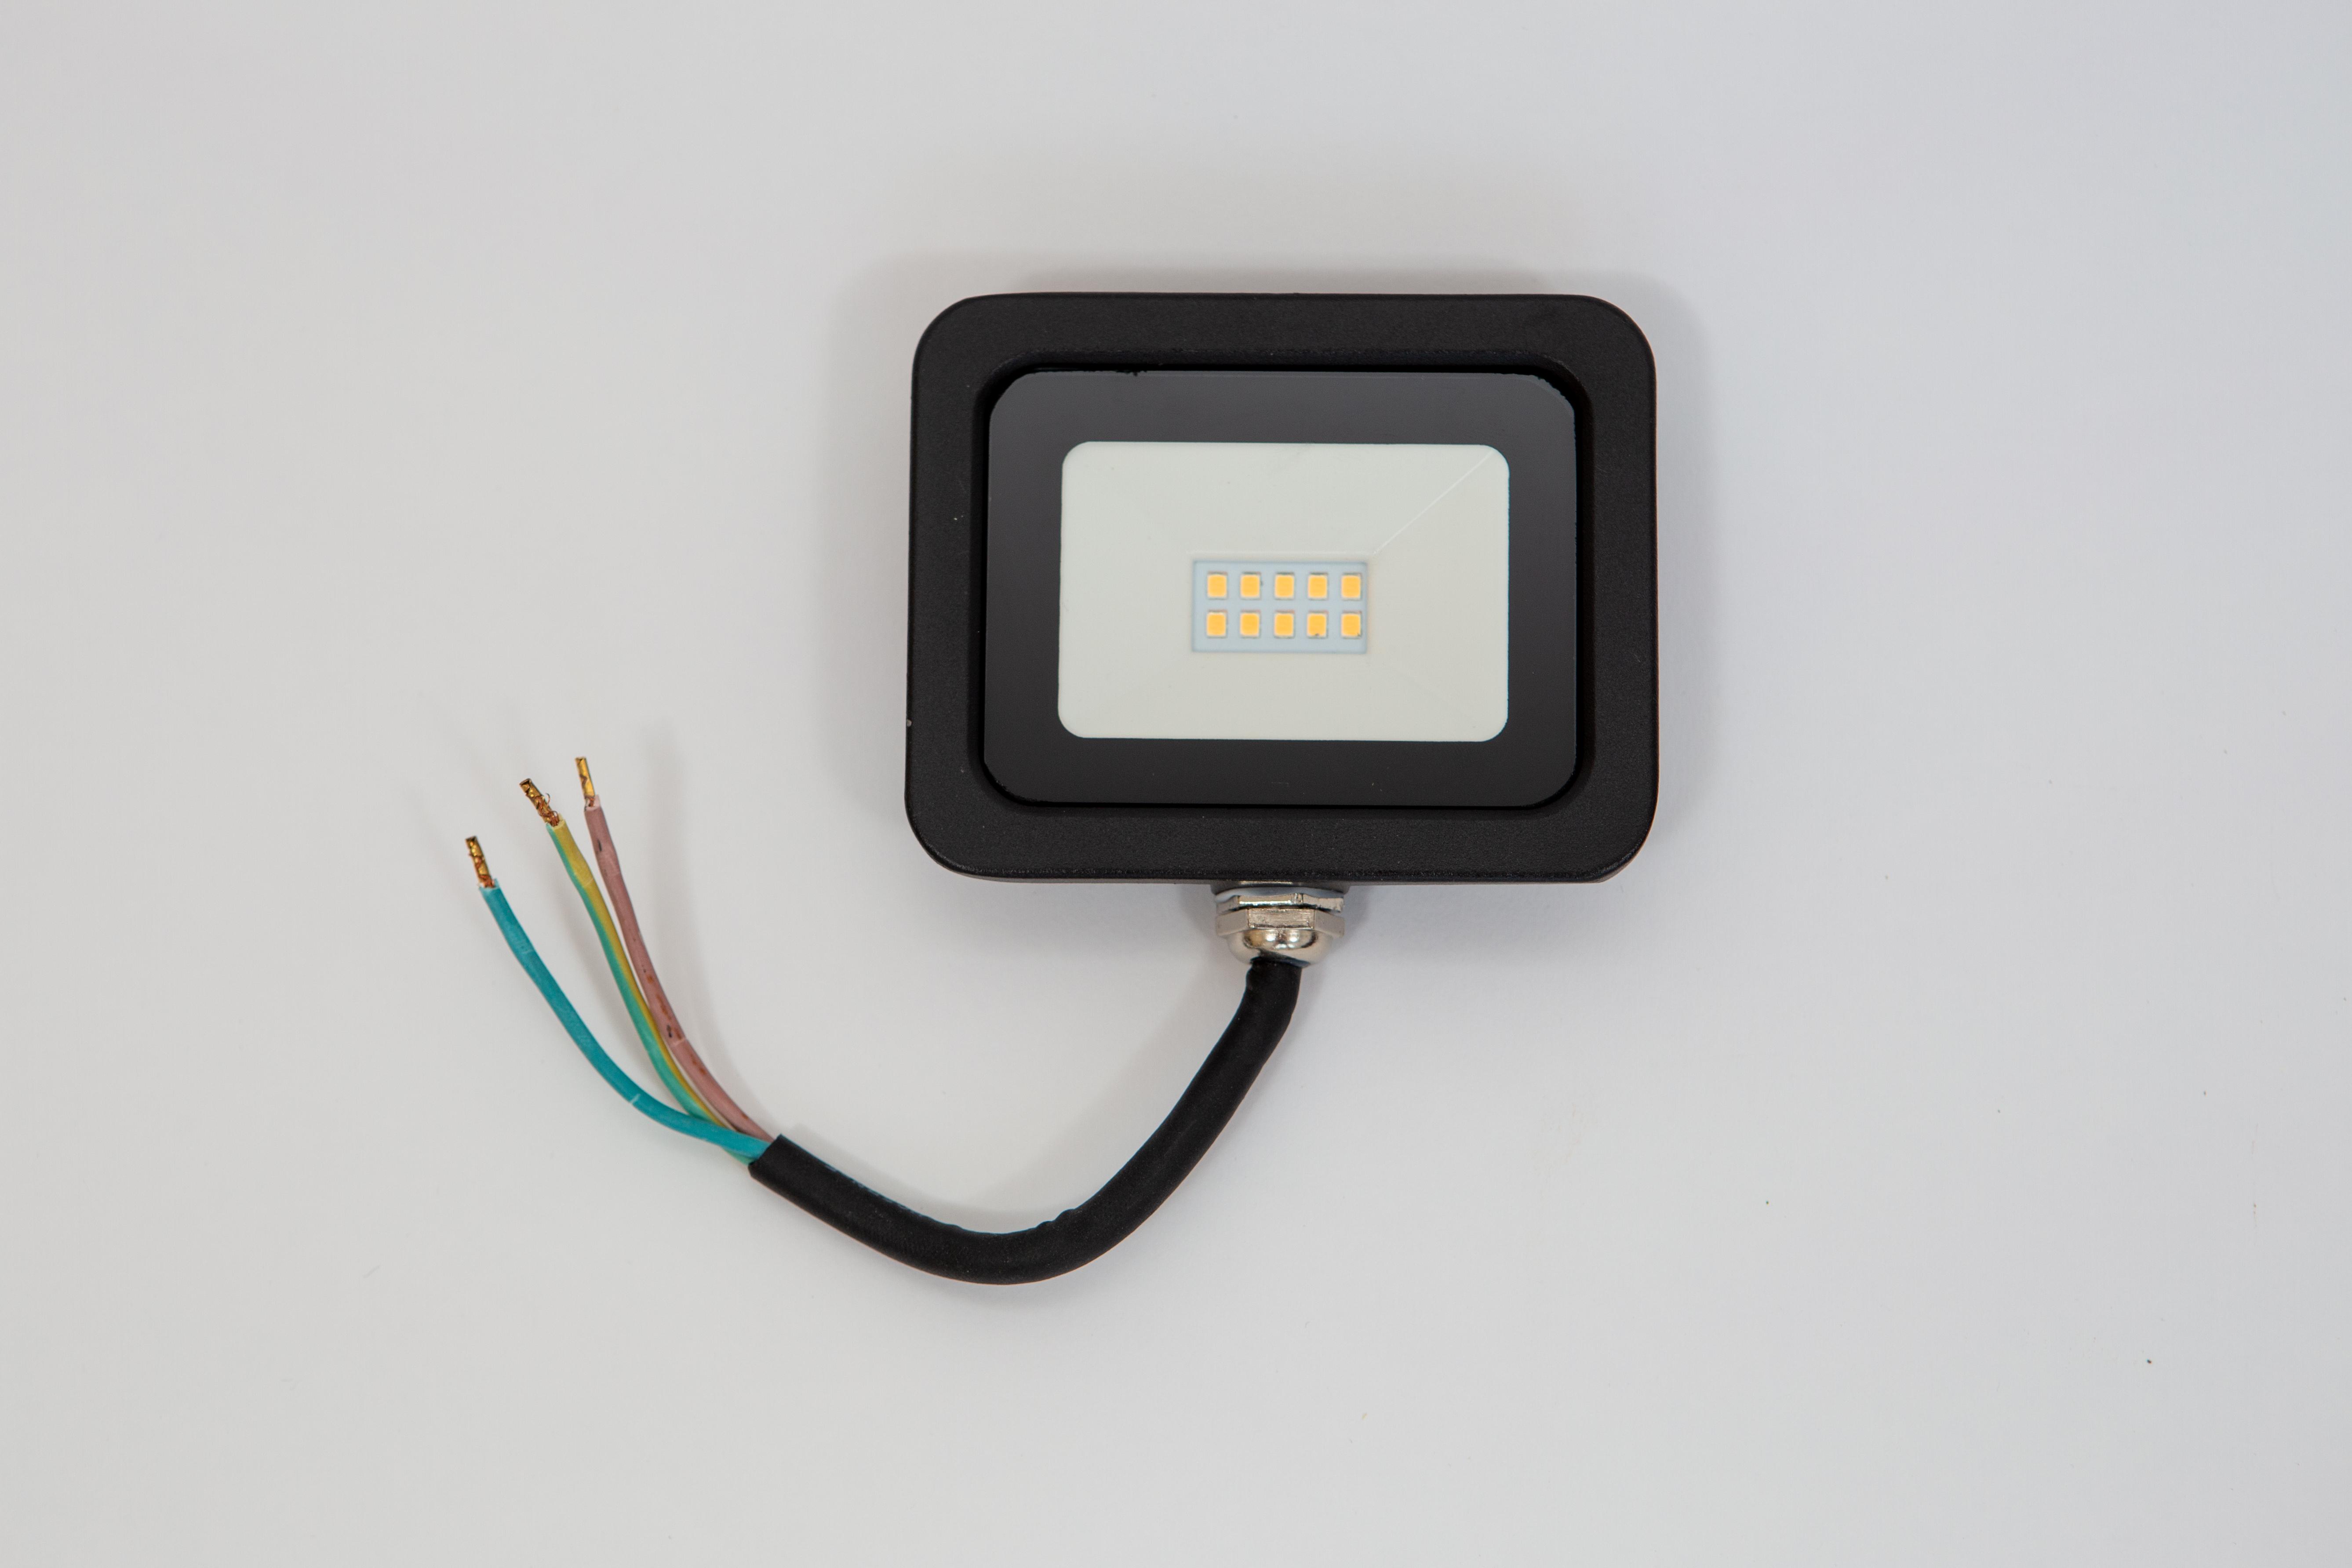 Proiector led 10 w, 810 lm, lumina calda ( 3000 k ), ip 65 , clasa a++,carcasa aluminiu negru [0]